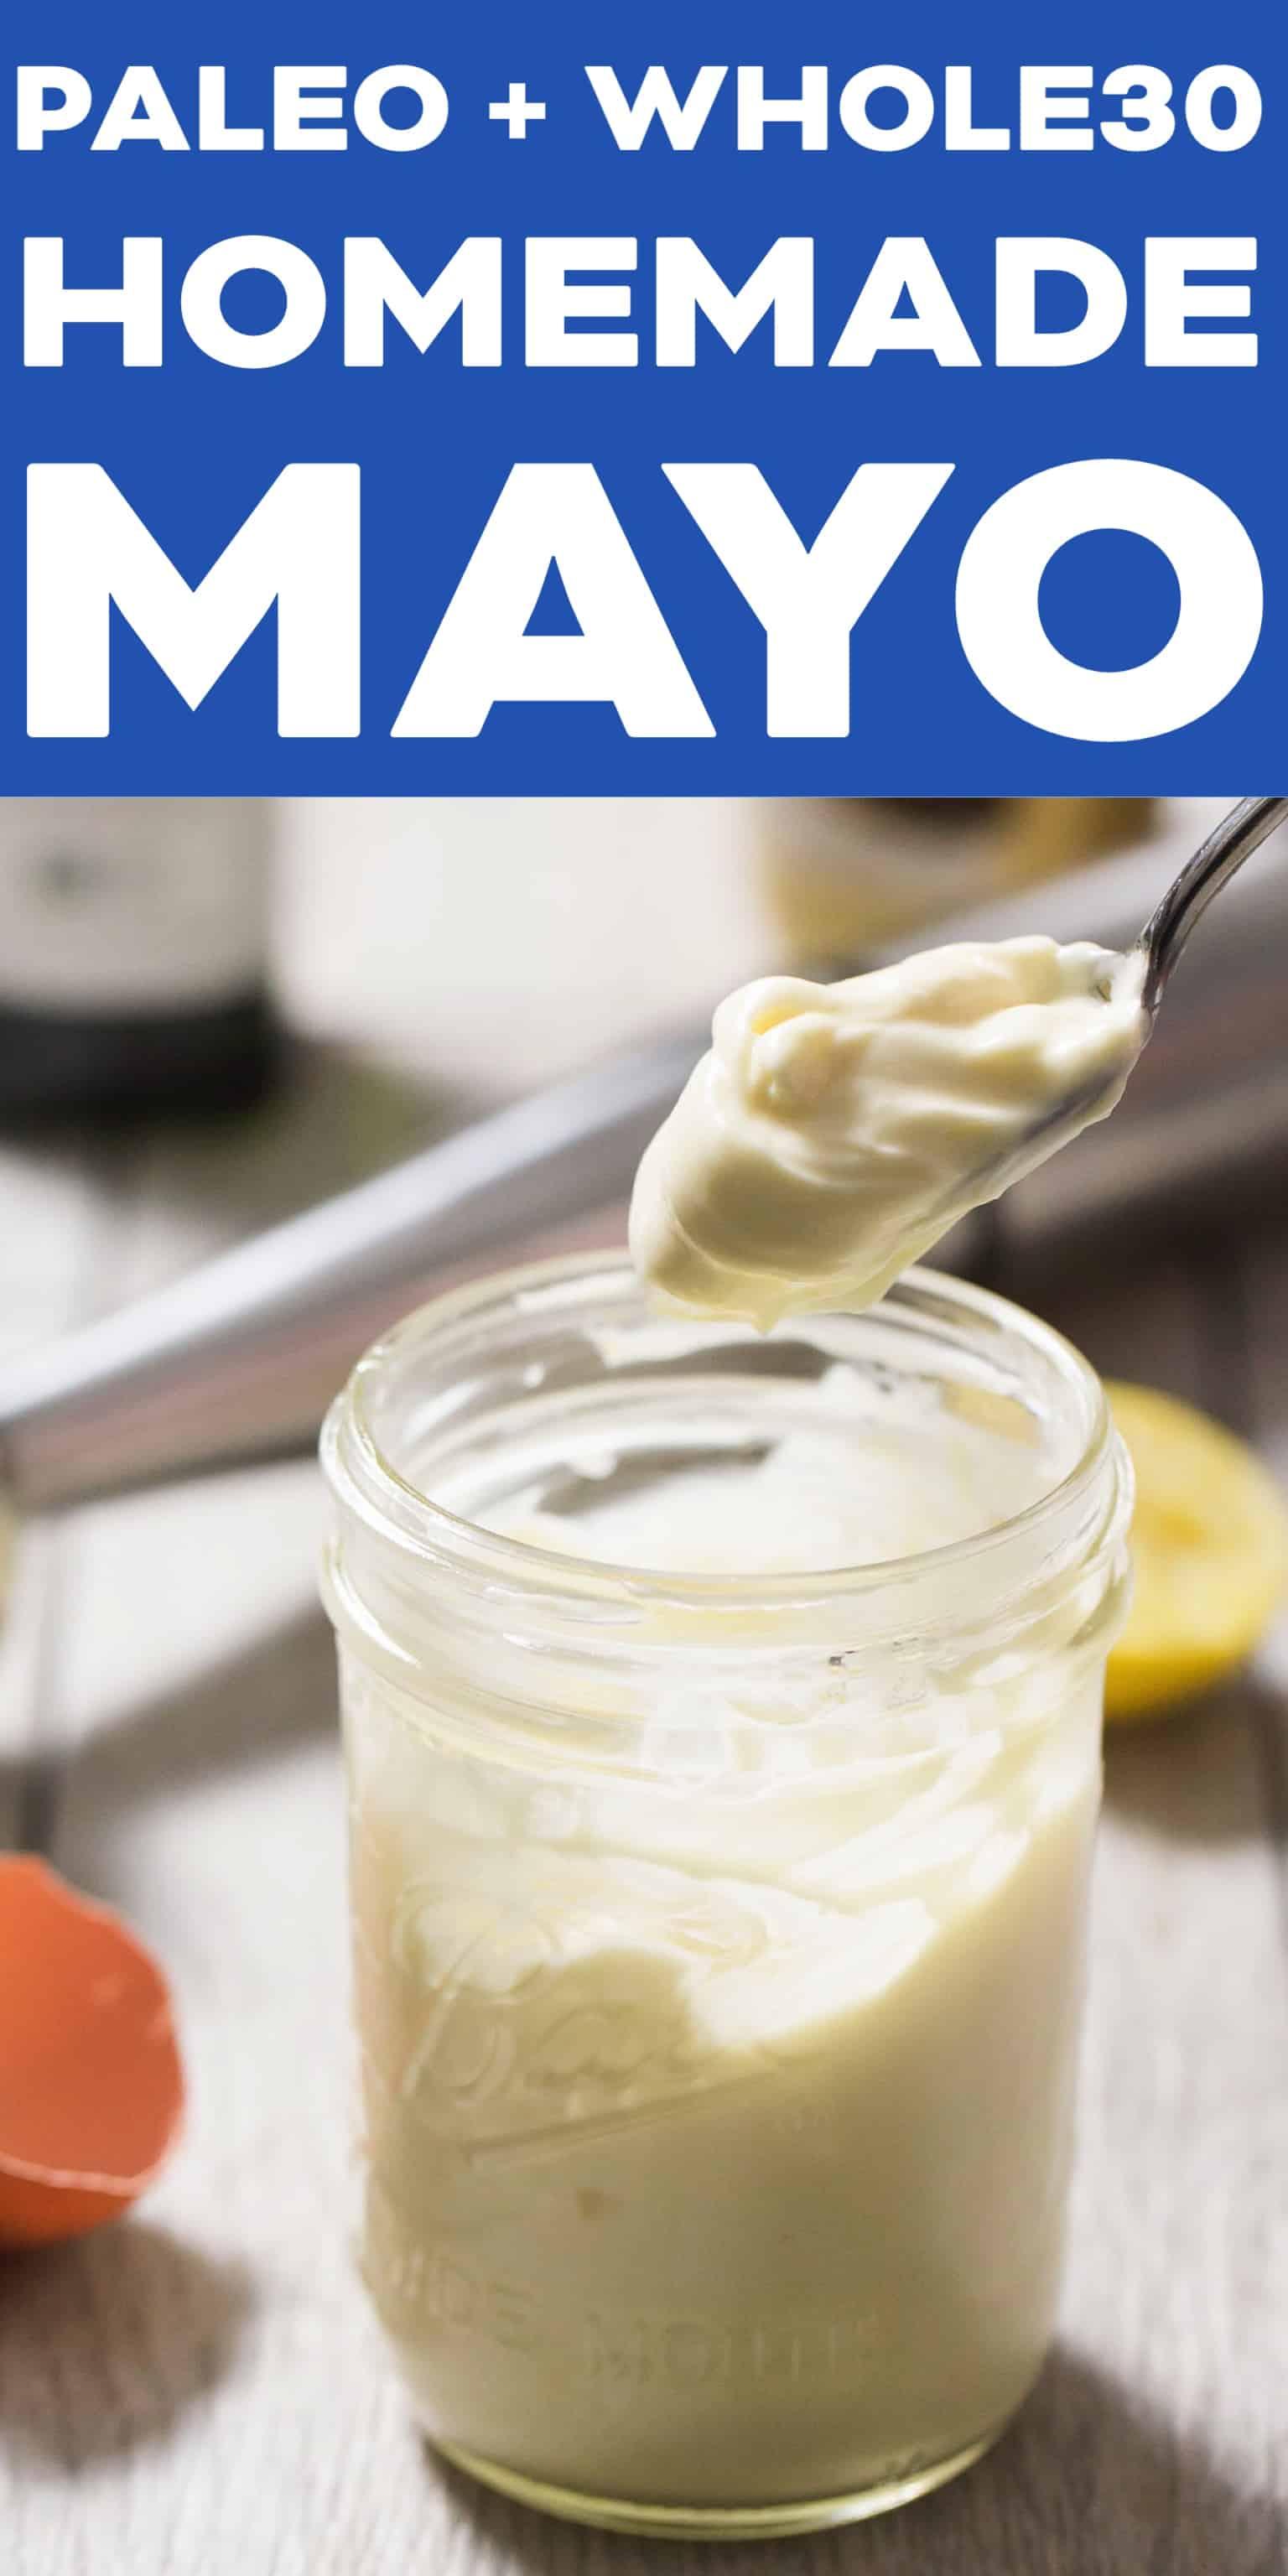 Easiest 3 Minute Homemade Mayonnaise (Paleo, Whole30